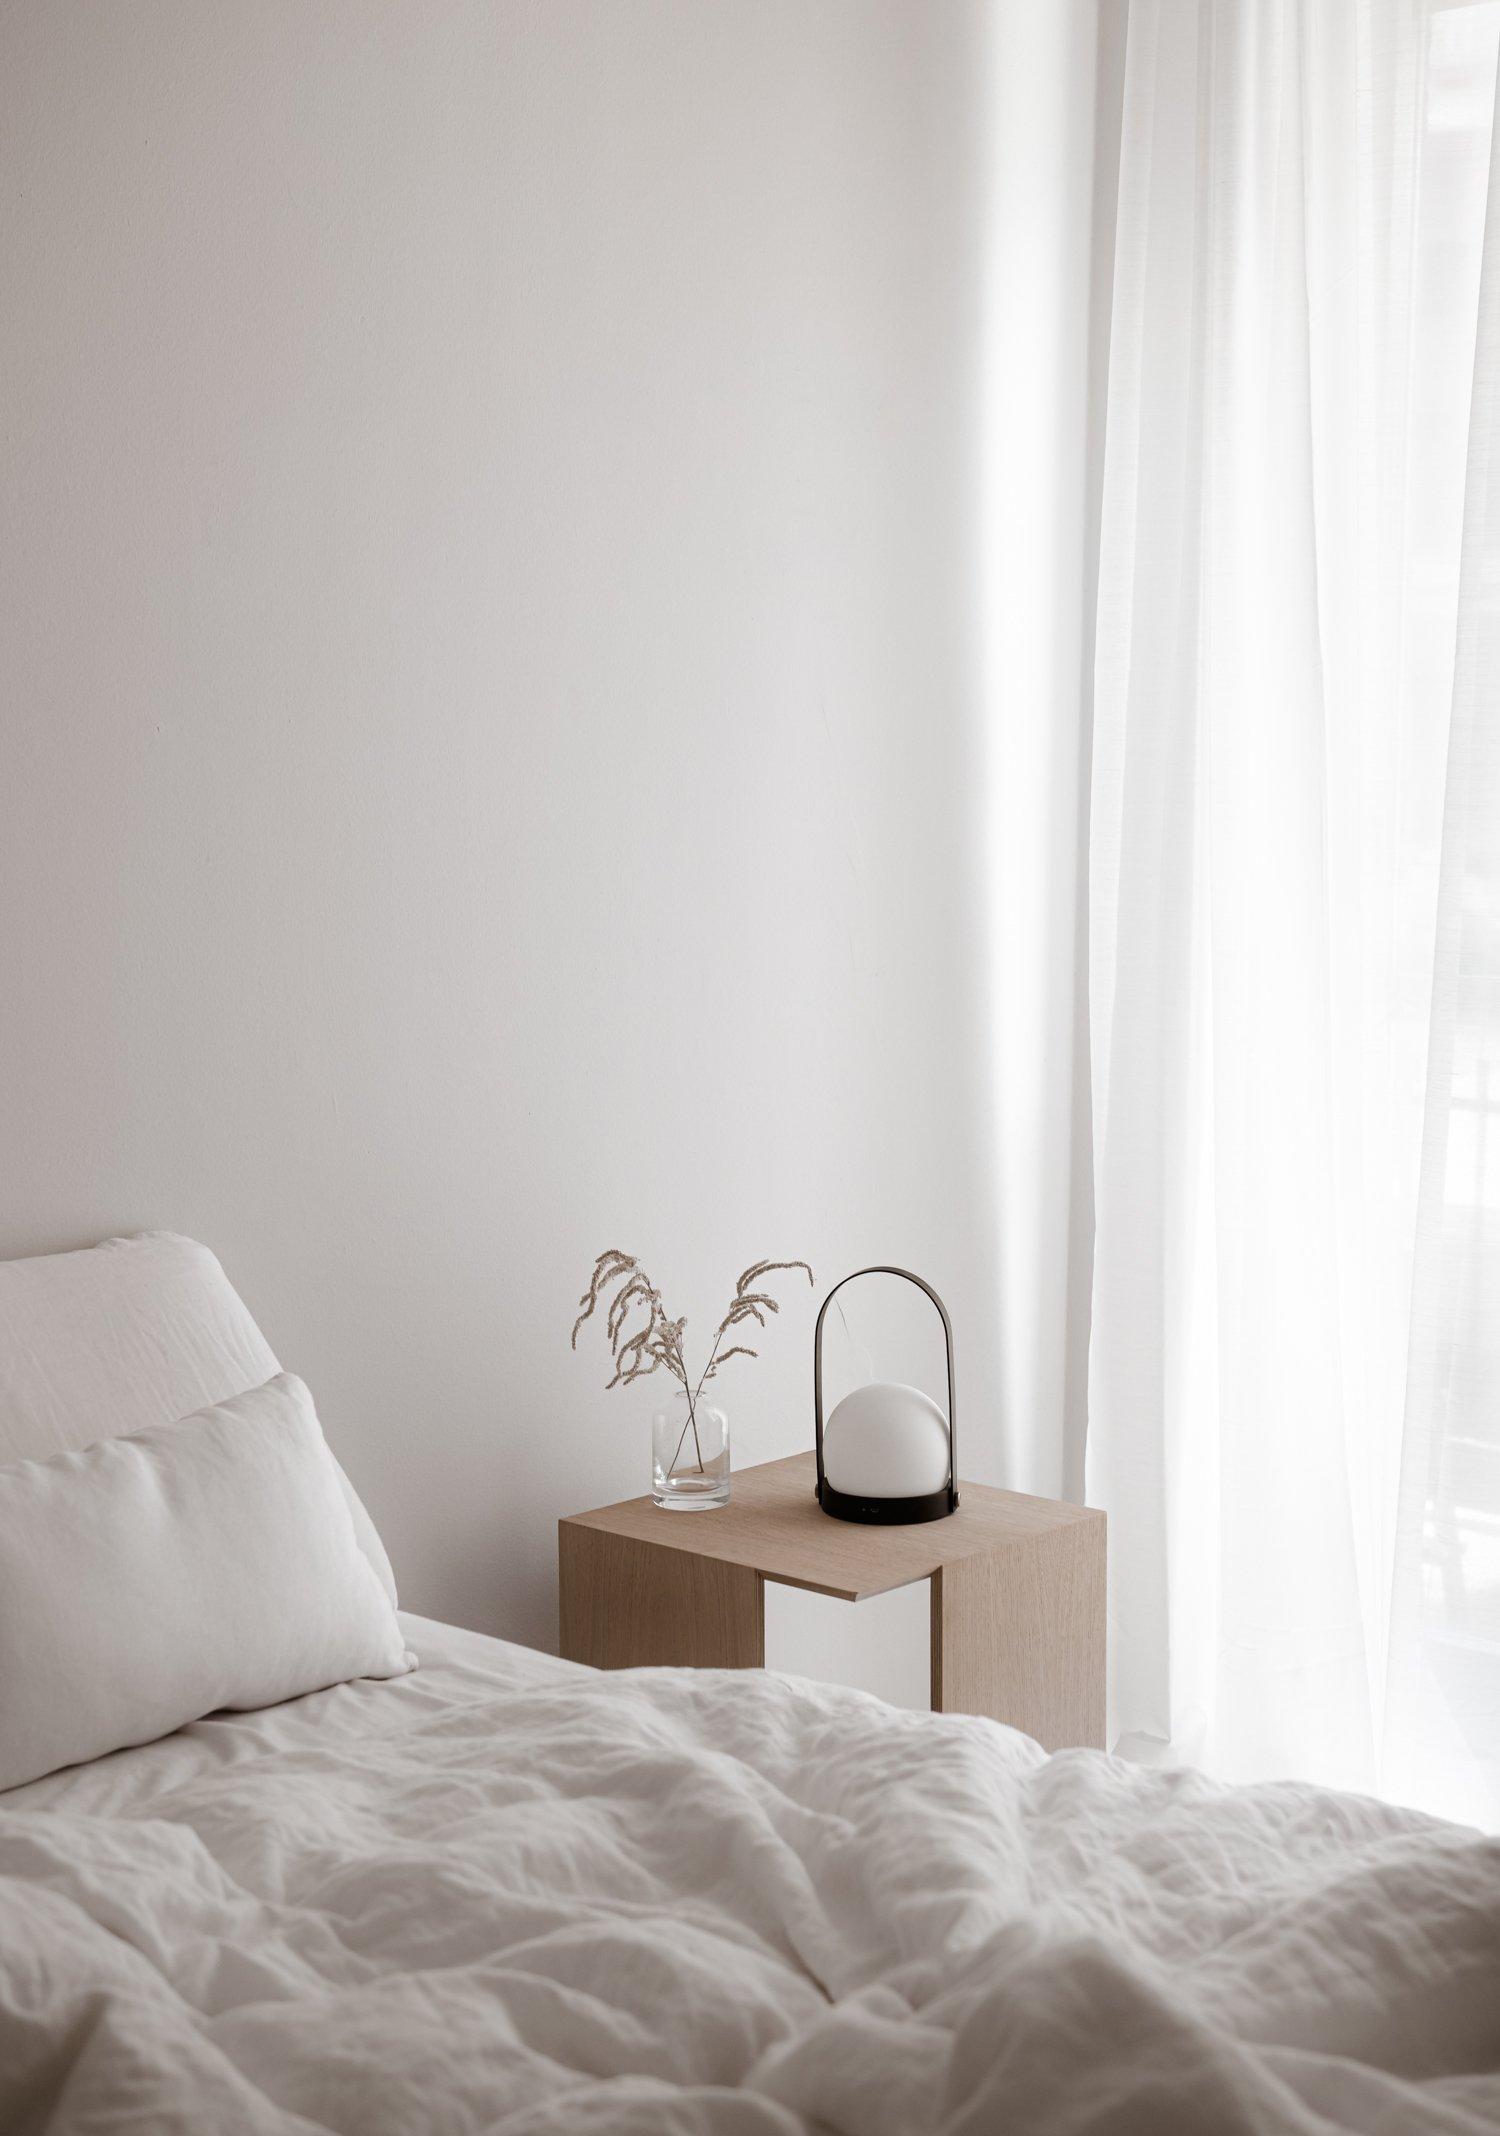 Minimal nightstand